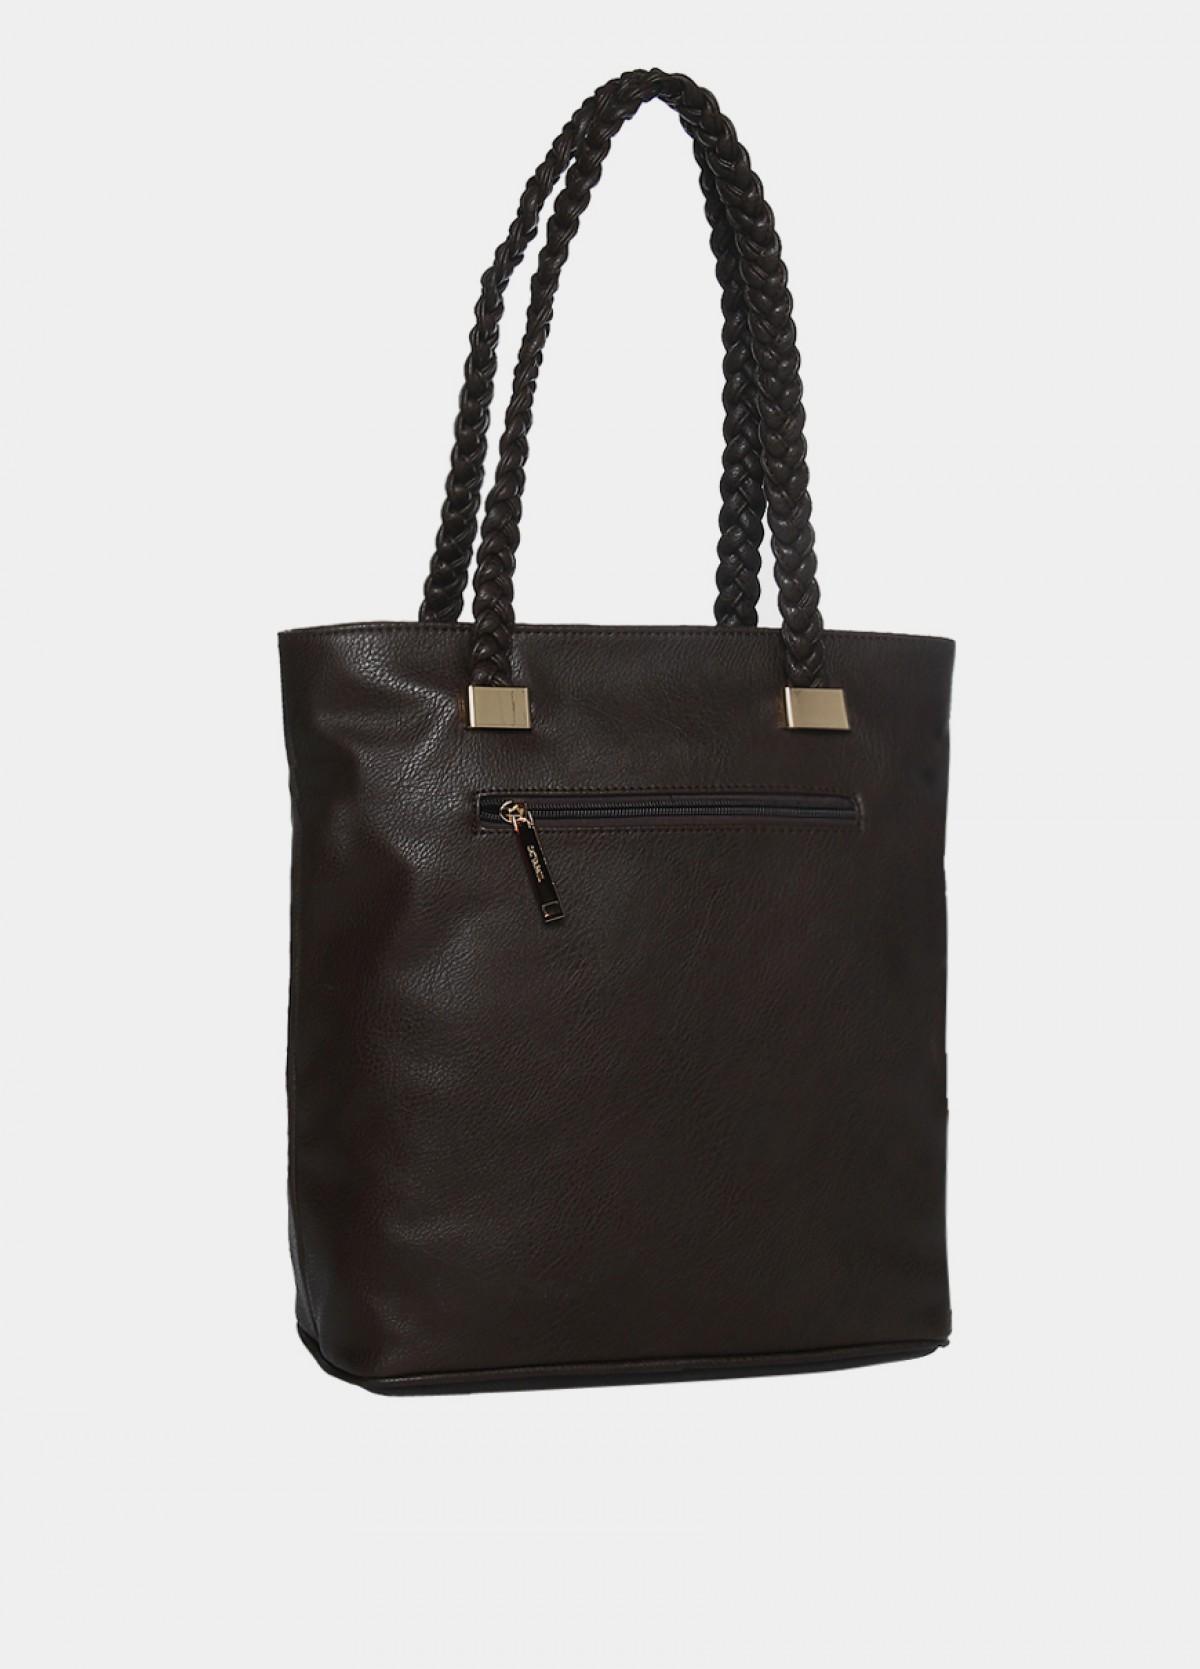 The Black Tote Handbag